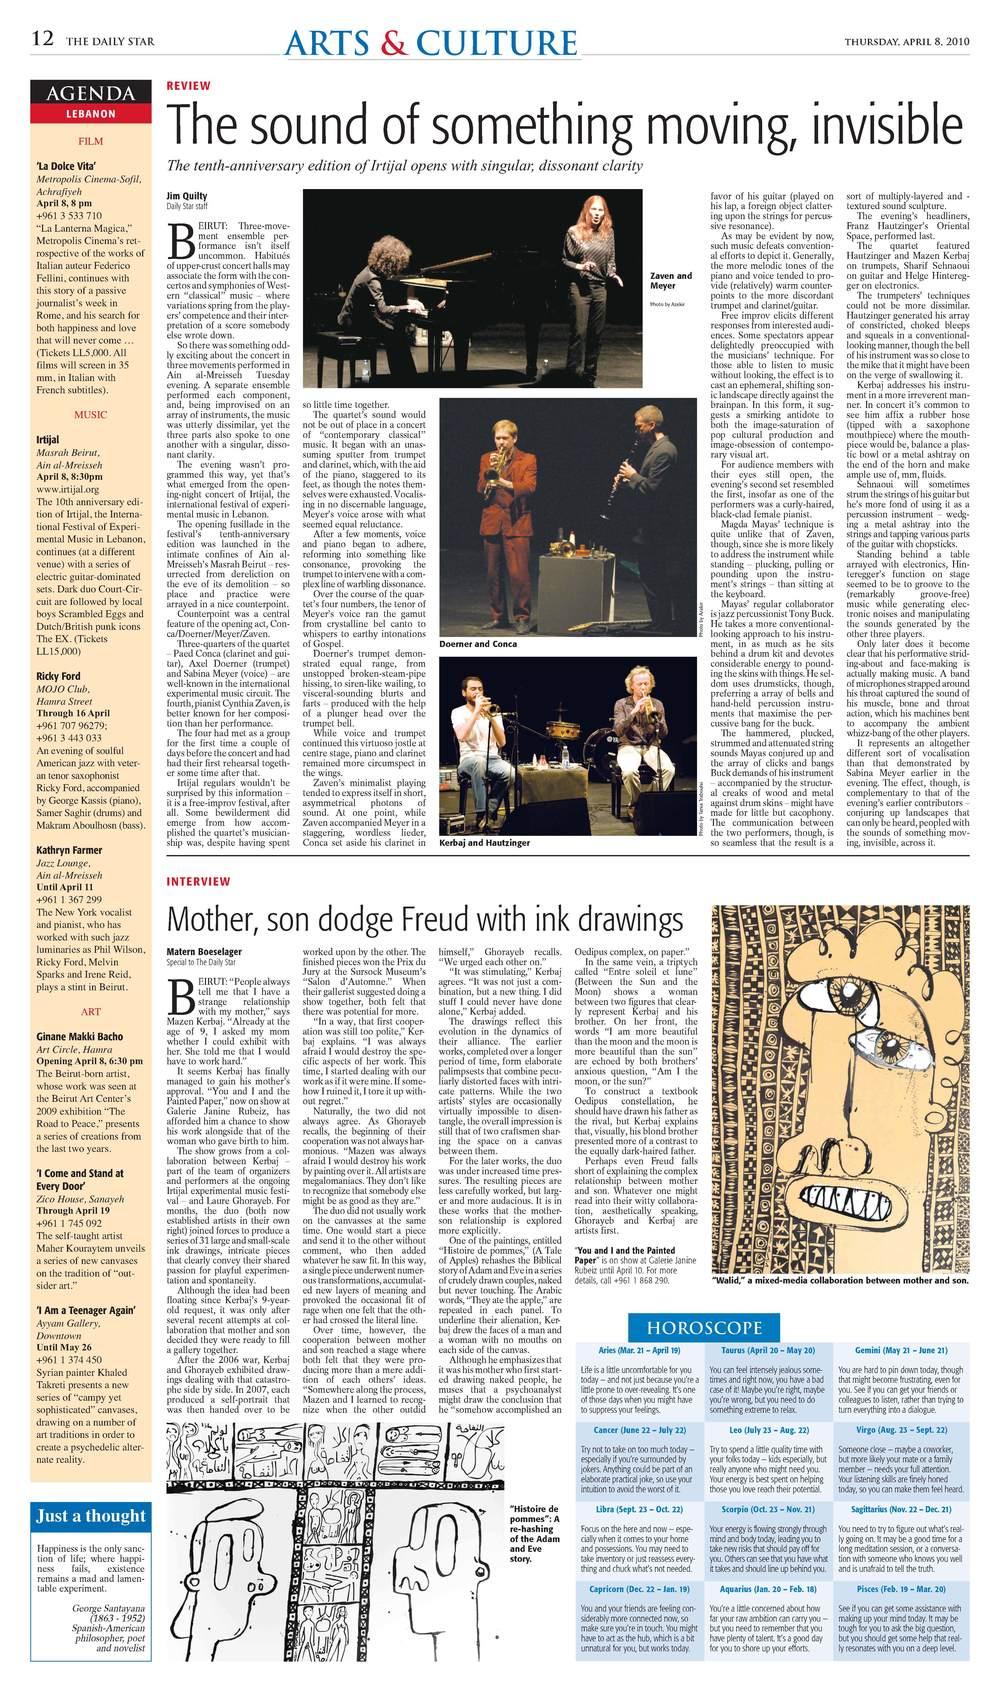 Daily Star_2_Cynthia Zaven.jpg